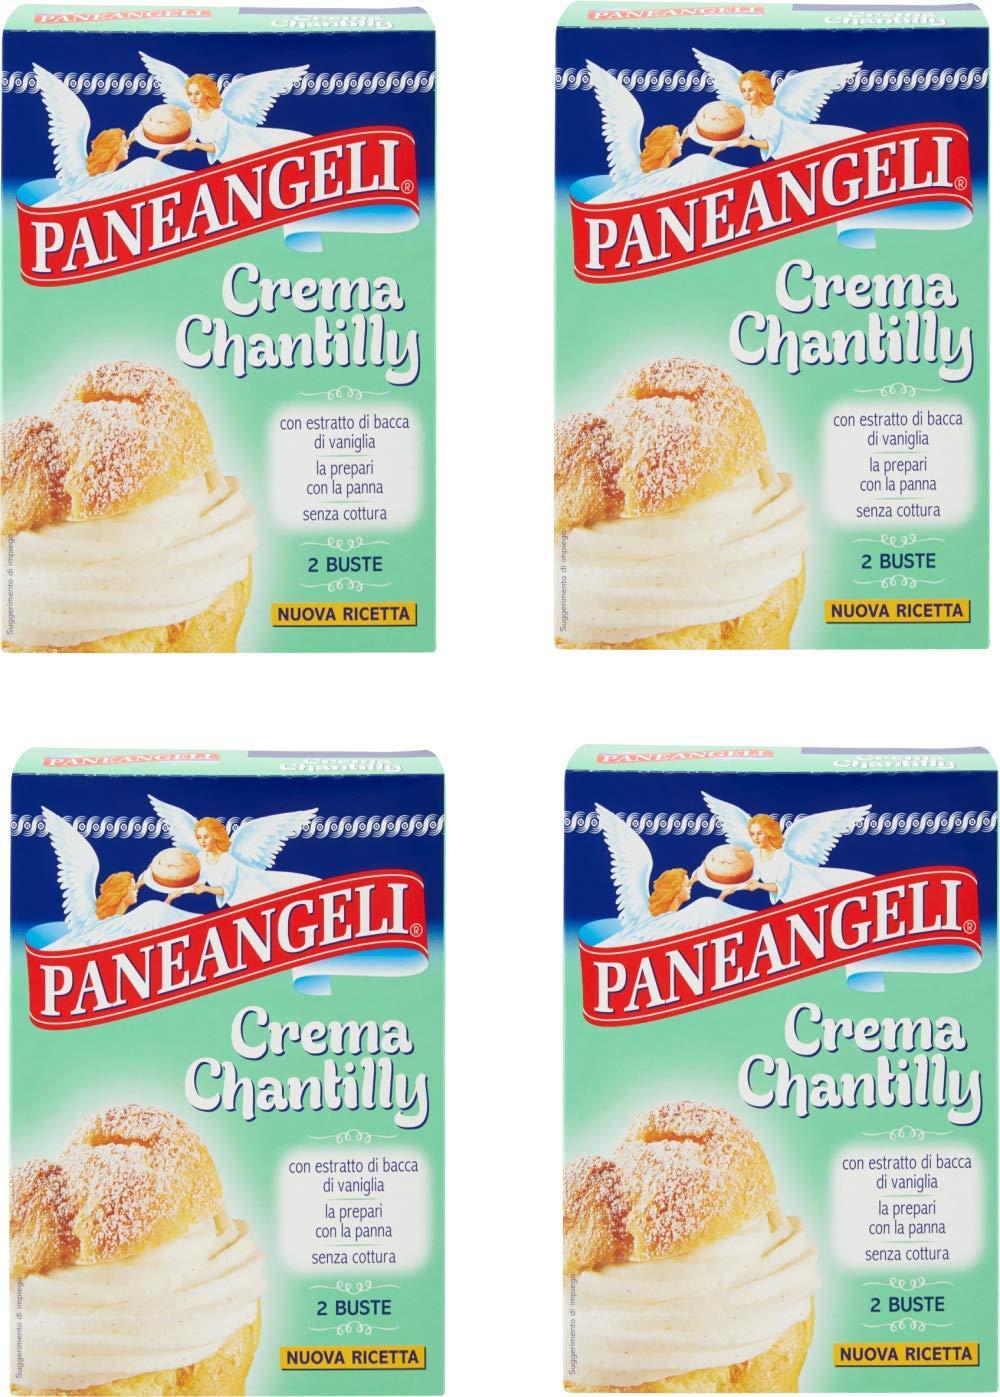 Paneangeli Crema Chantilly Pastry Cream Powder Mix 2.82oz 80g, Pack of 4